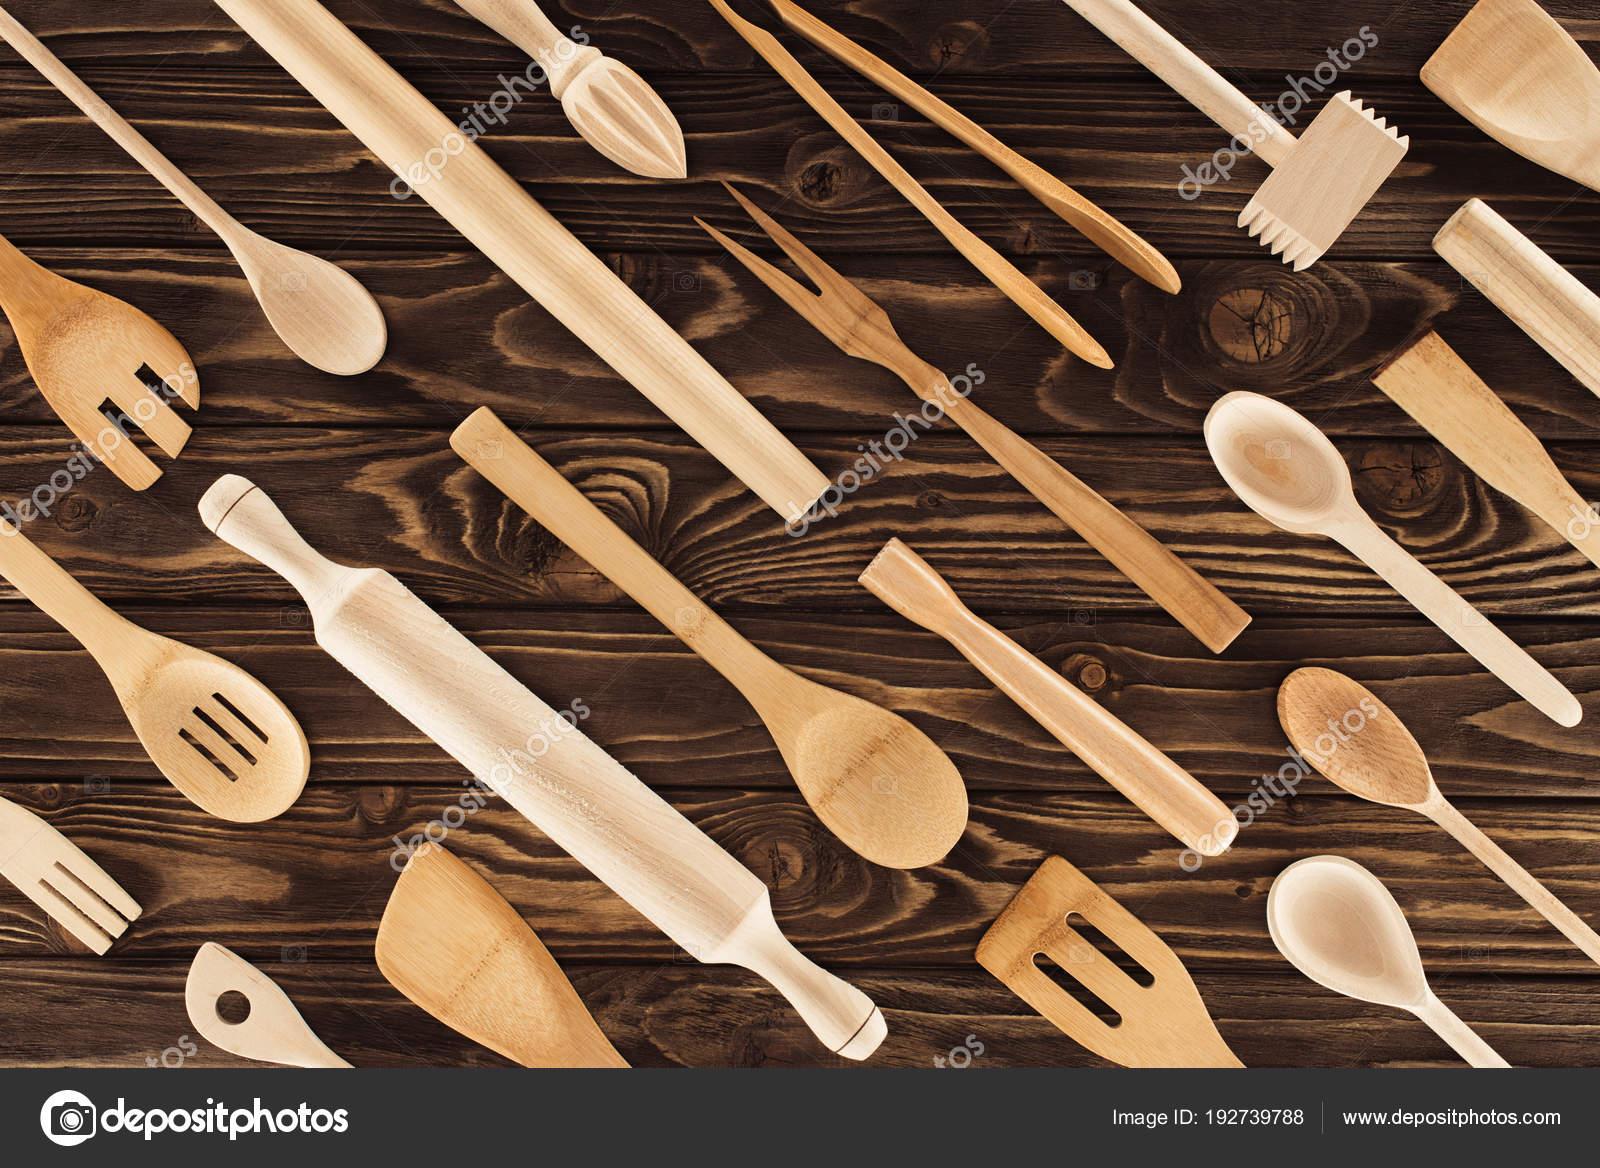 wood table kitchen to go cabinets 木桌厨房用具的顶部视图 图库照片 c vadimvasenin 192739788